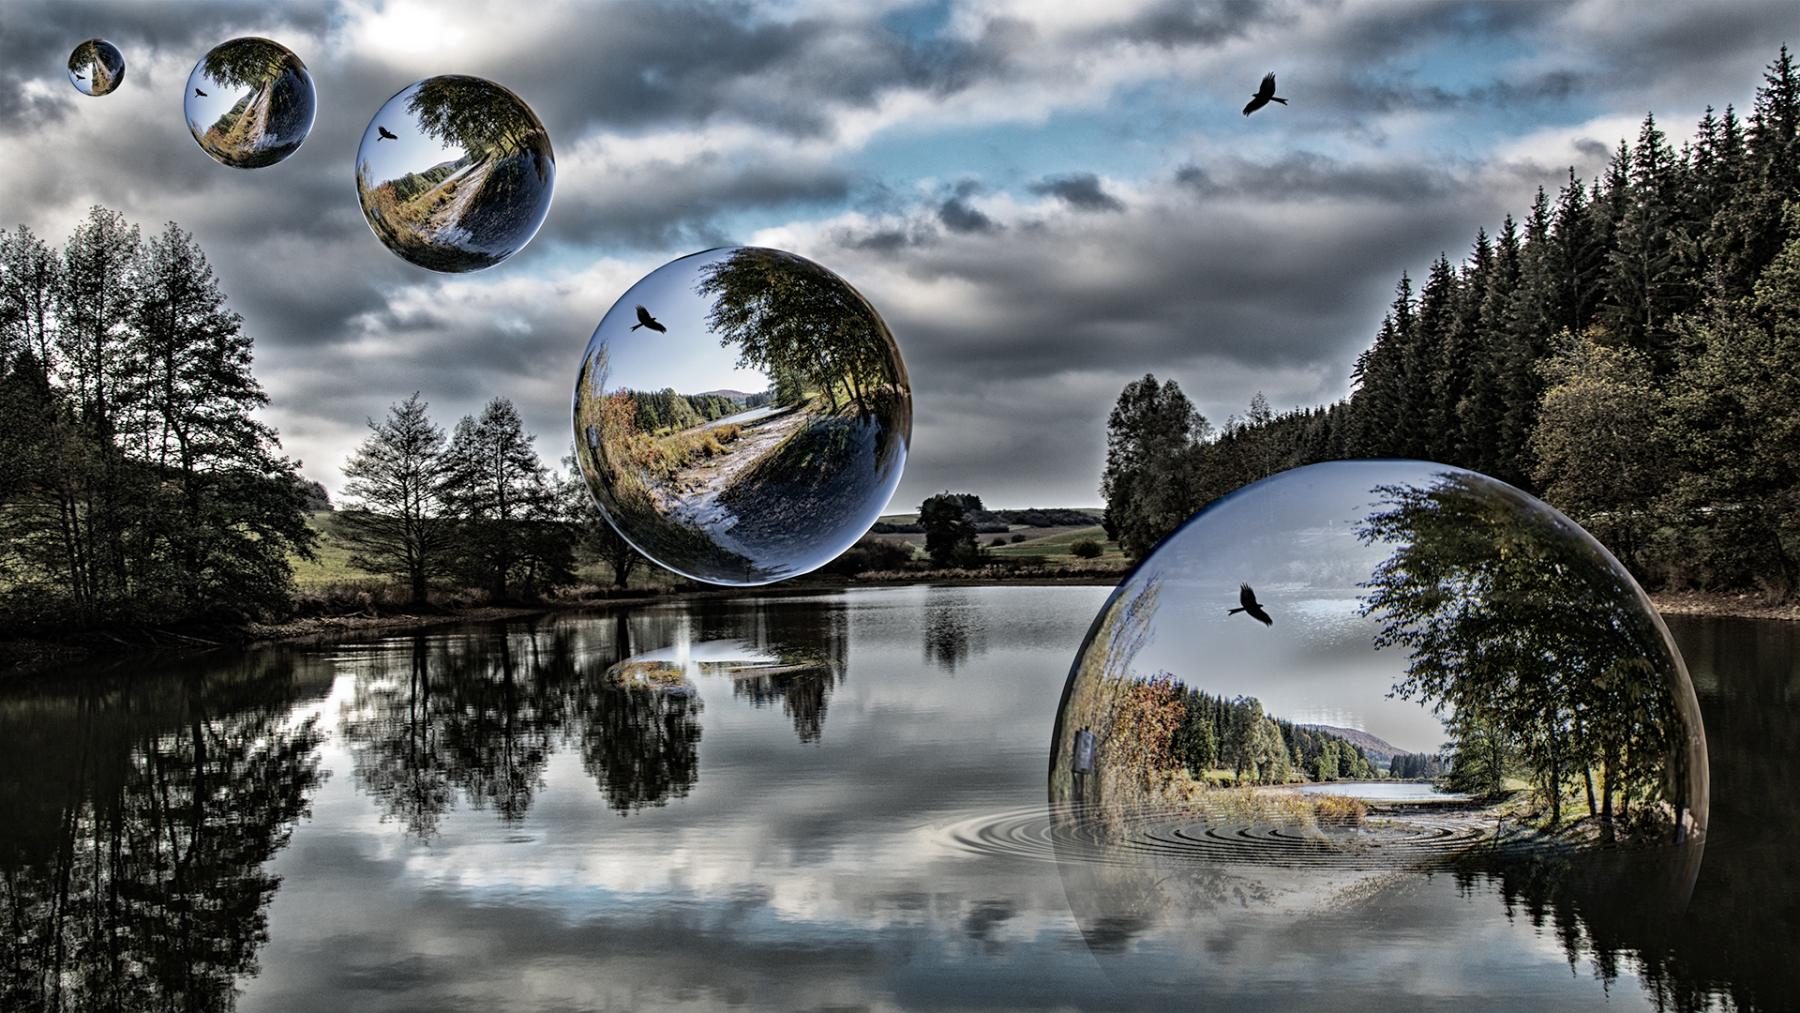 Lake_Sphere_1_w_nik_filter_HD